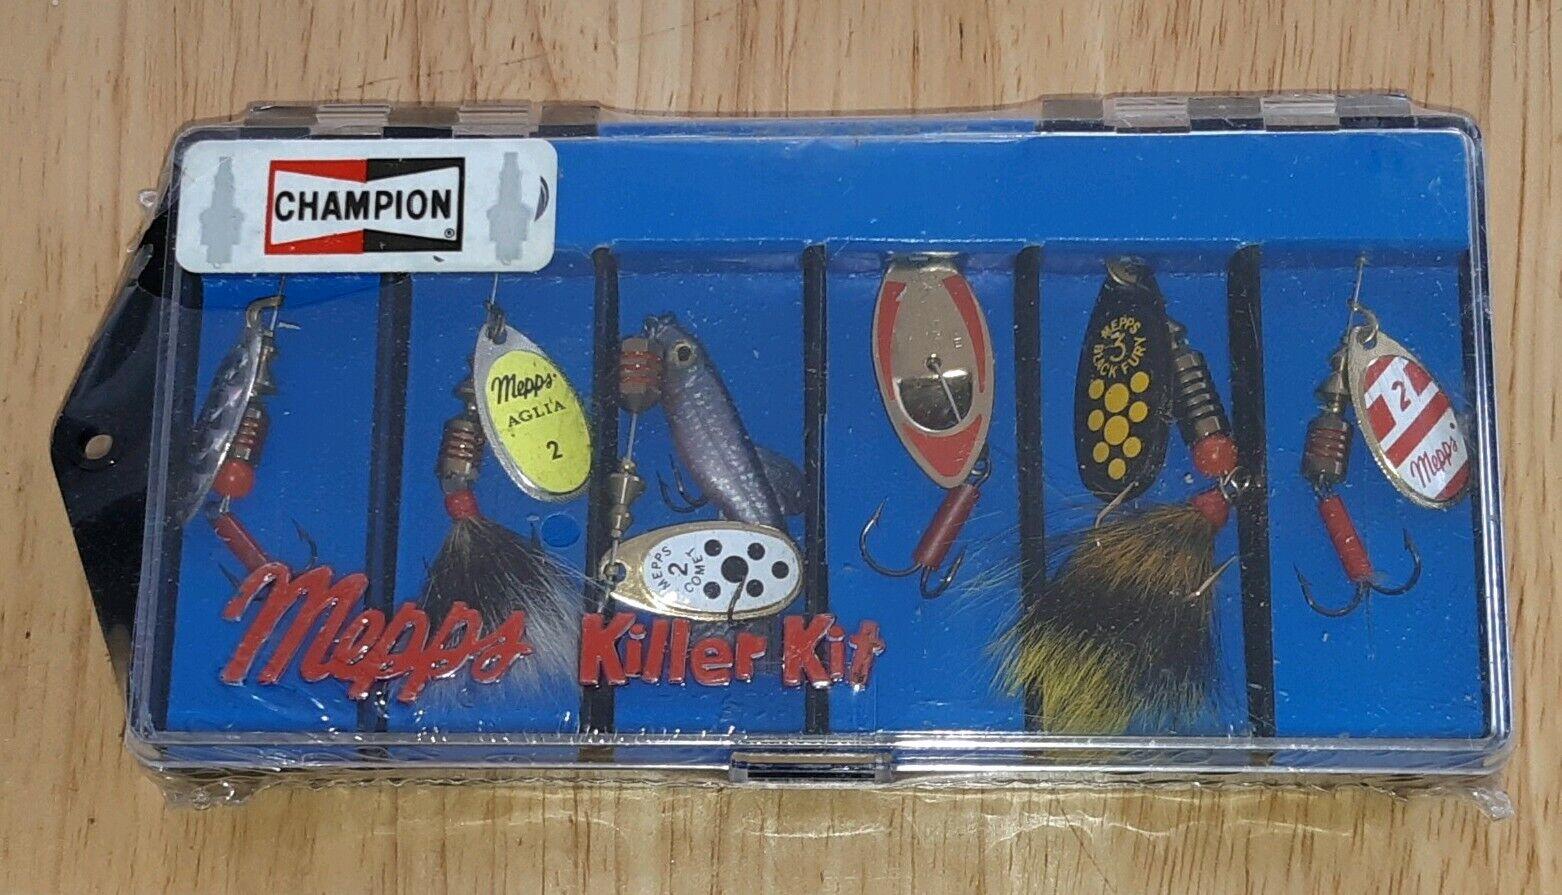 CHAMPION SPARK PLUGS PROMO Mepps Killer Kit Set of 6 Fishing